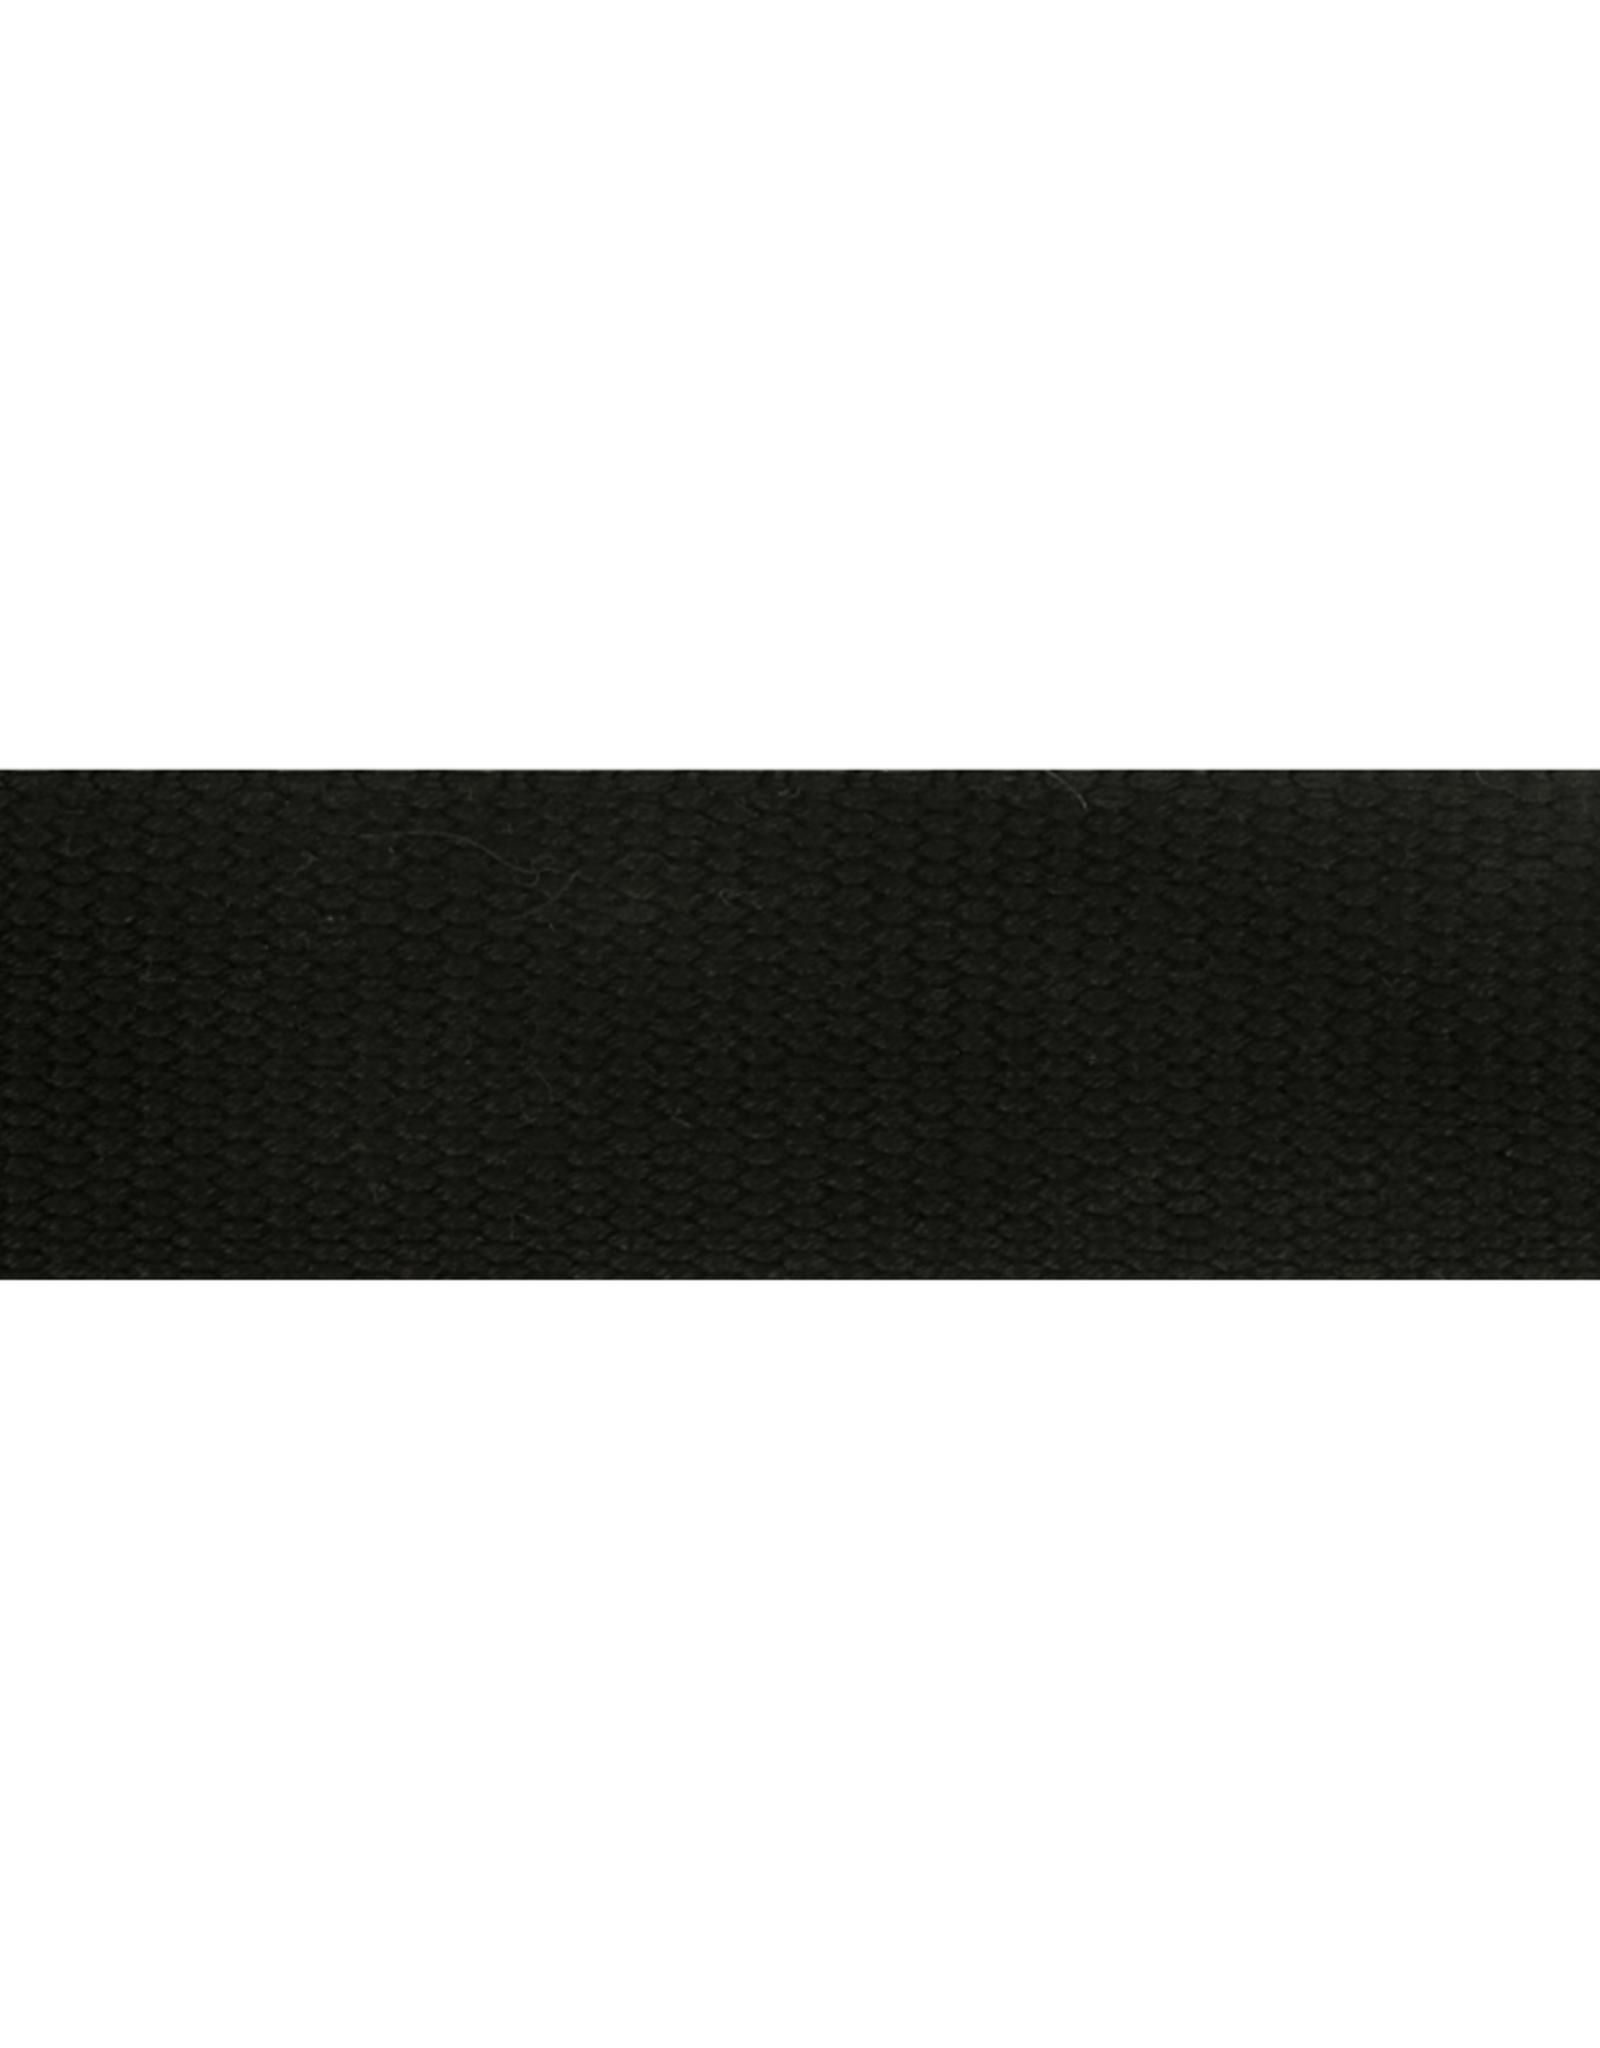 Rassenband zwart 38mm